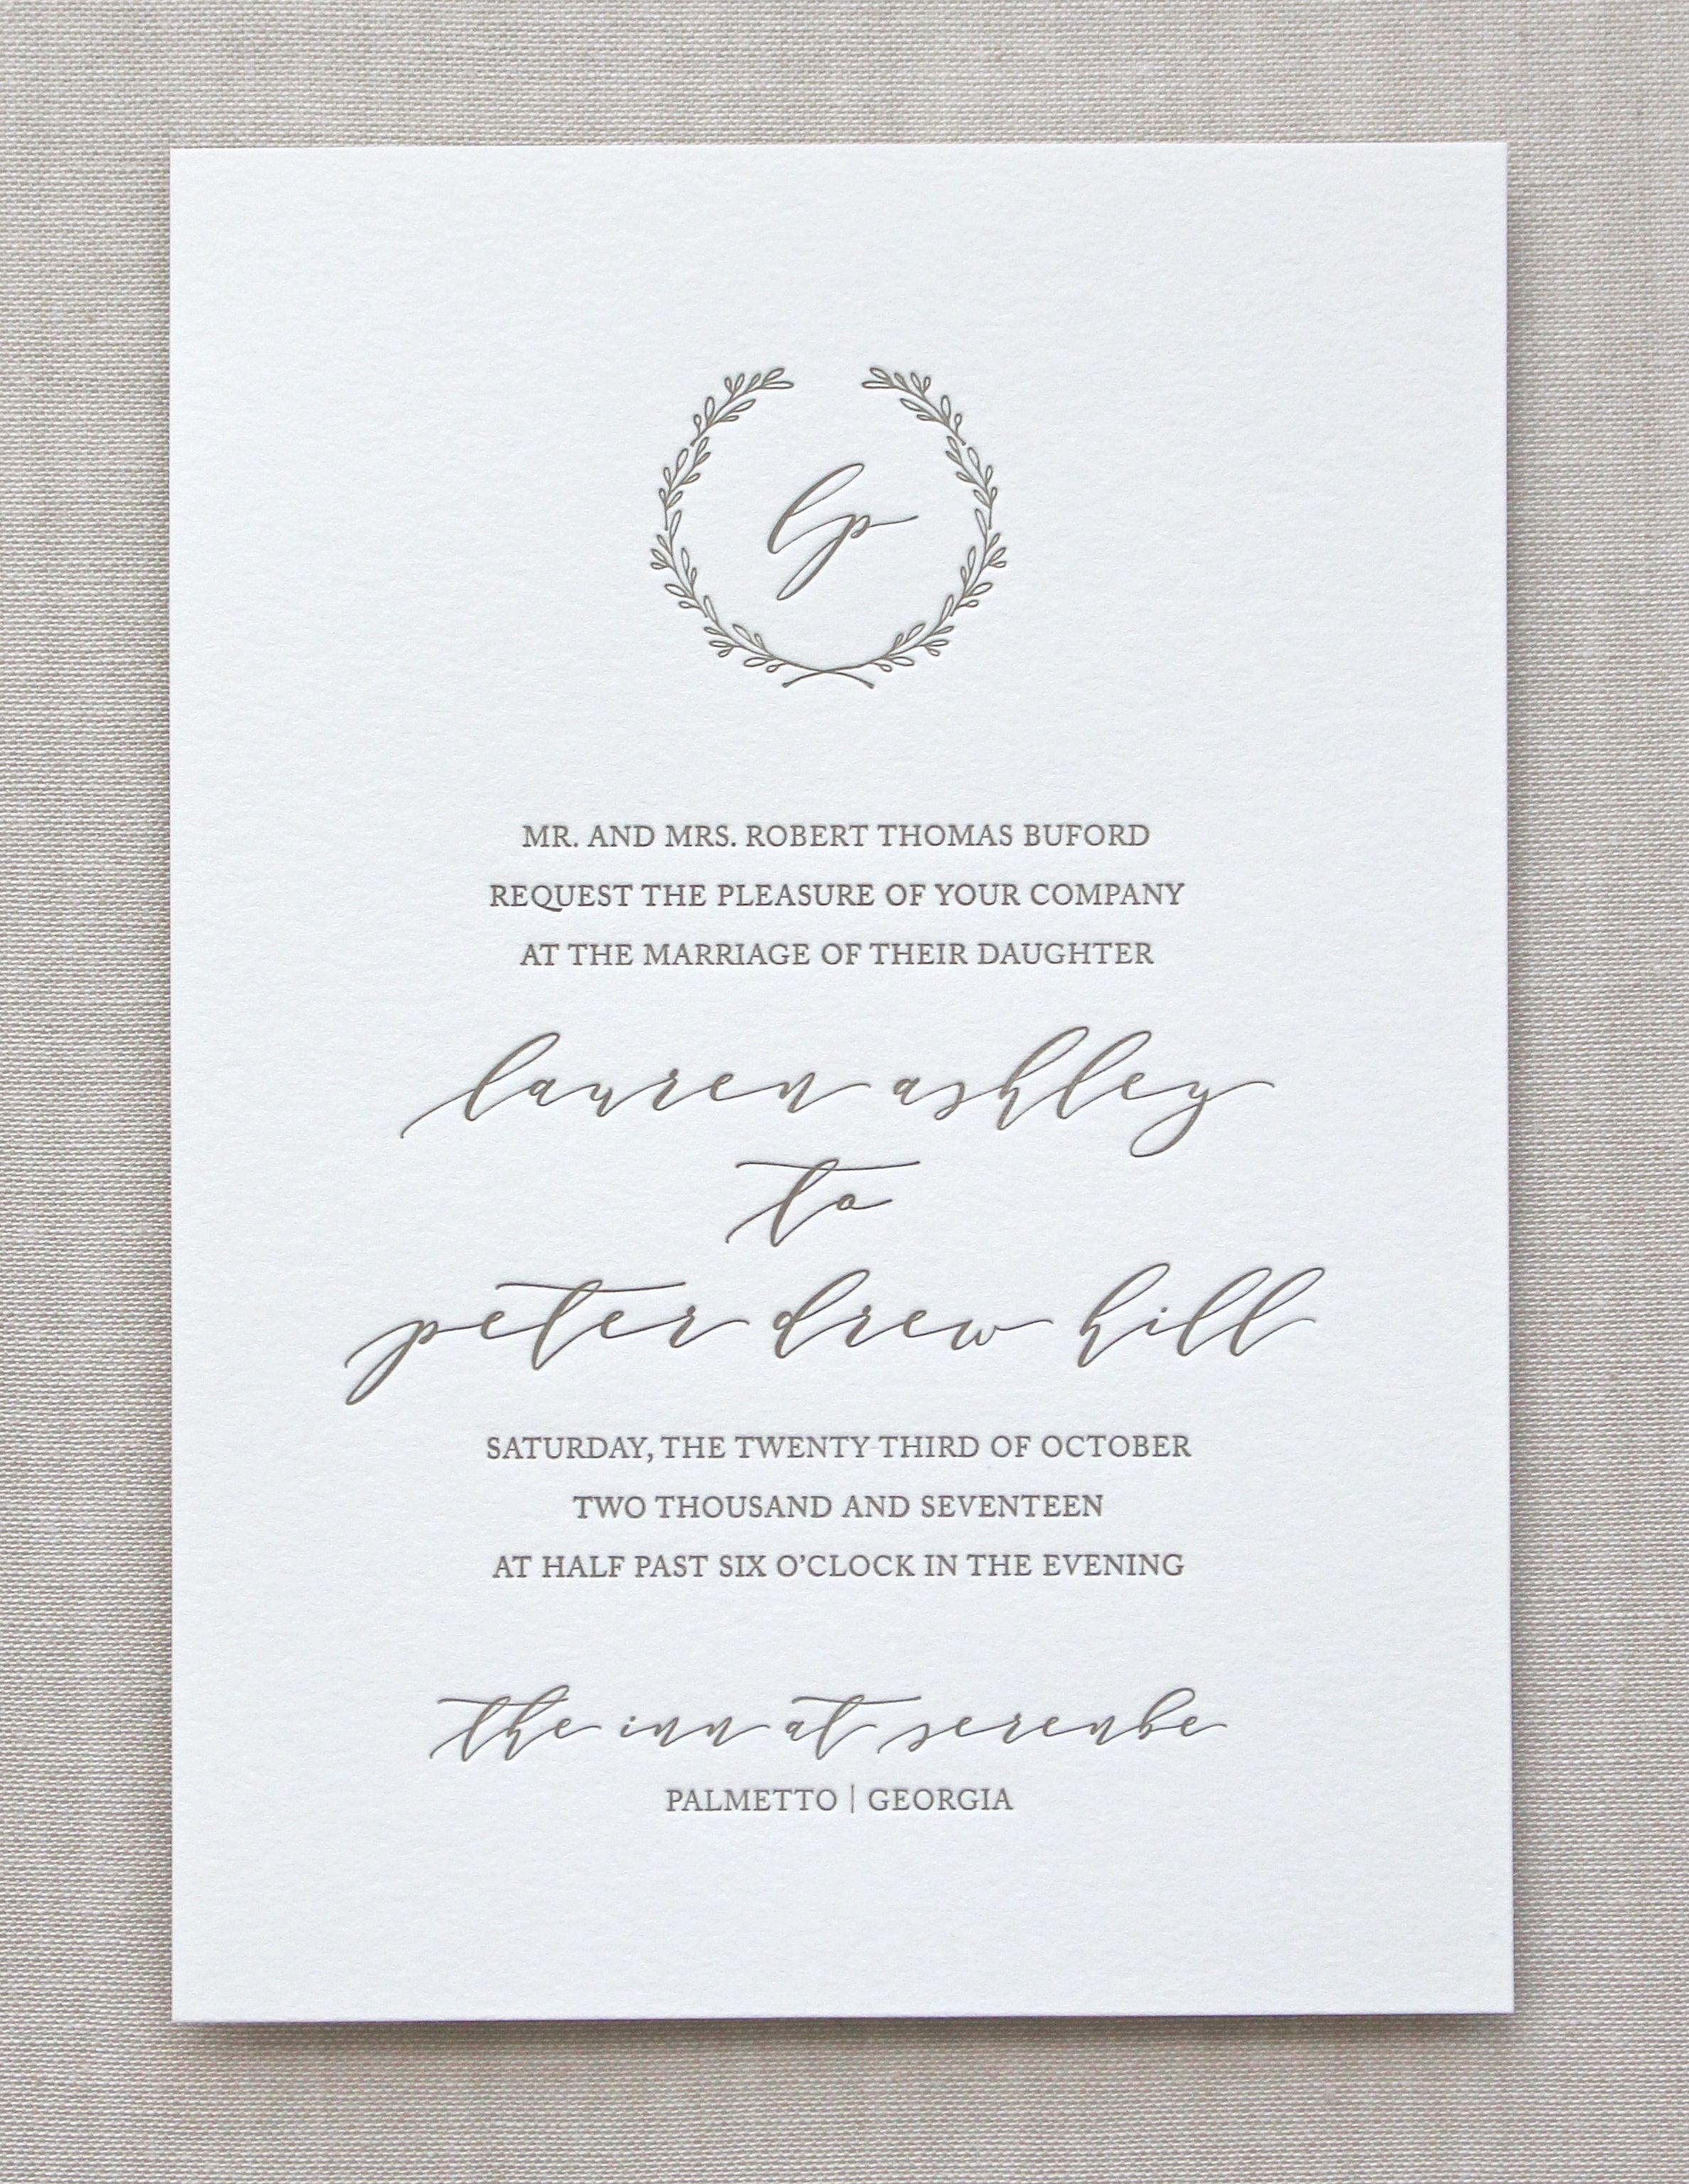 Serenbe Modern Wreath Letterpresses And Weddings